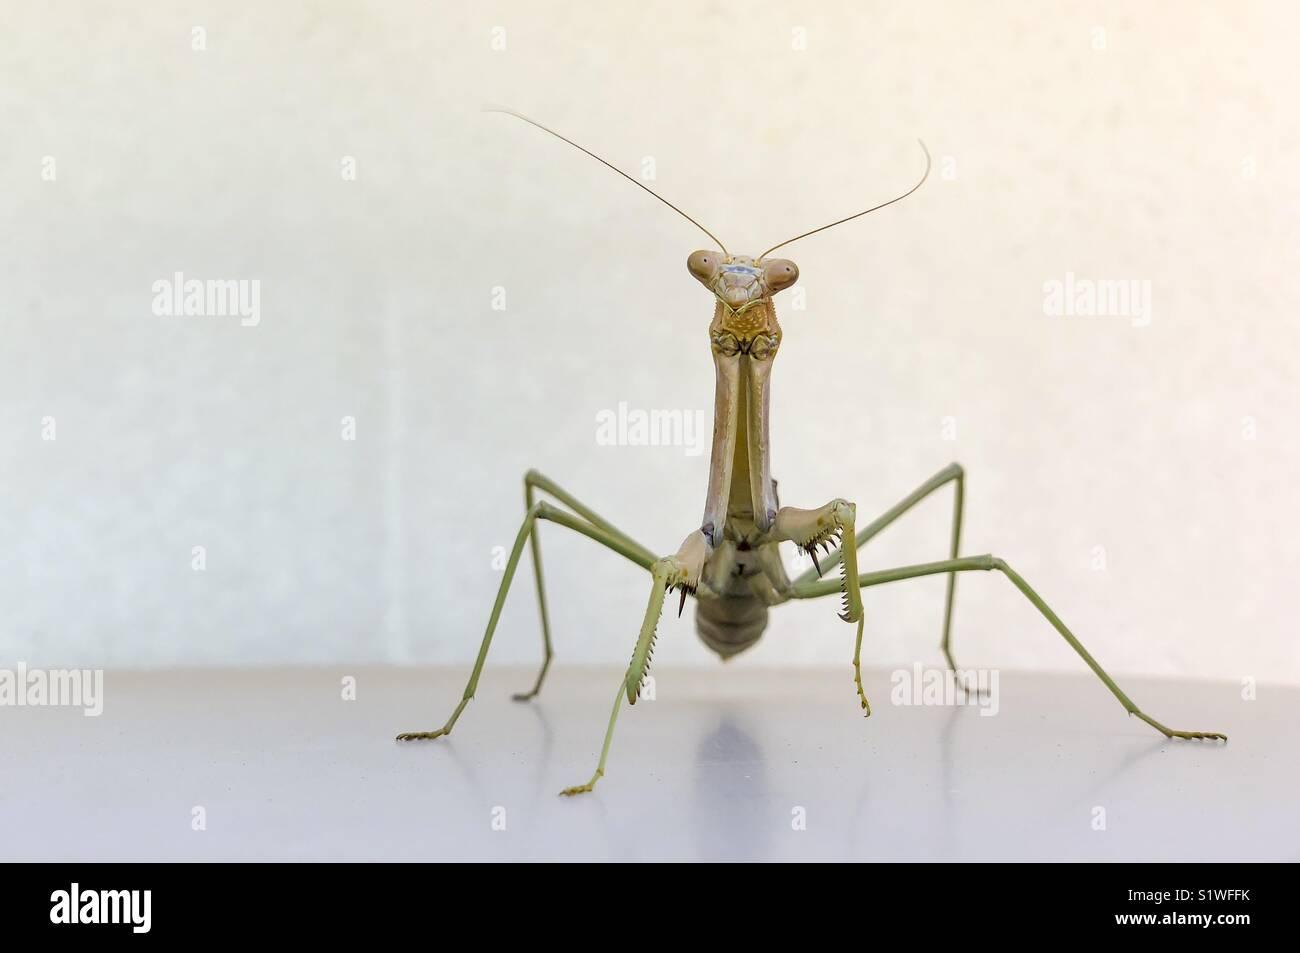 Giant Praying Mantis Stock Photo